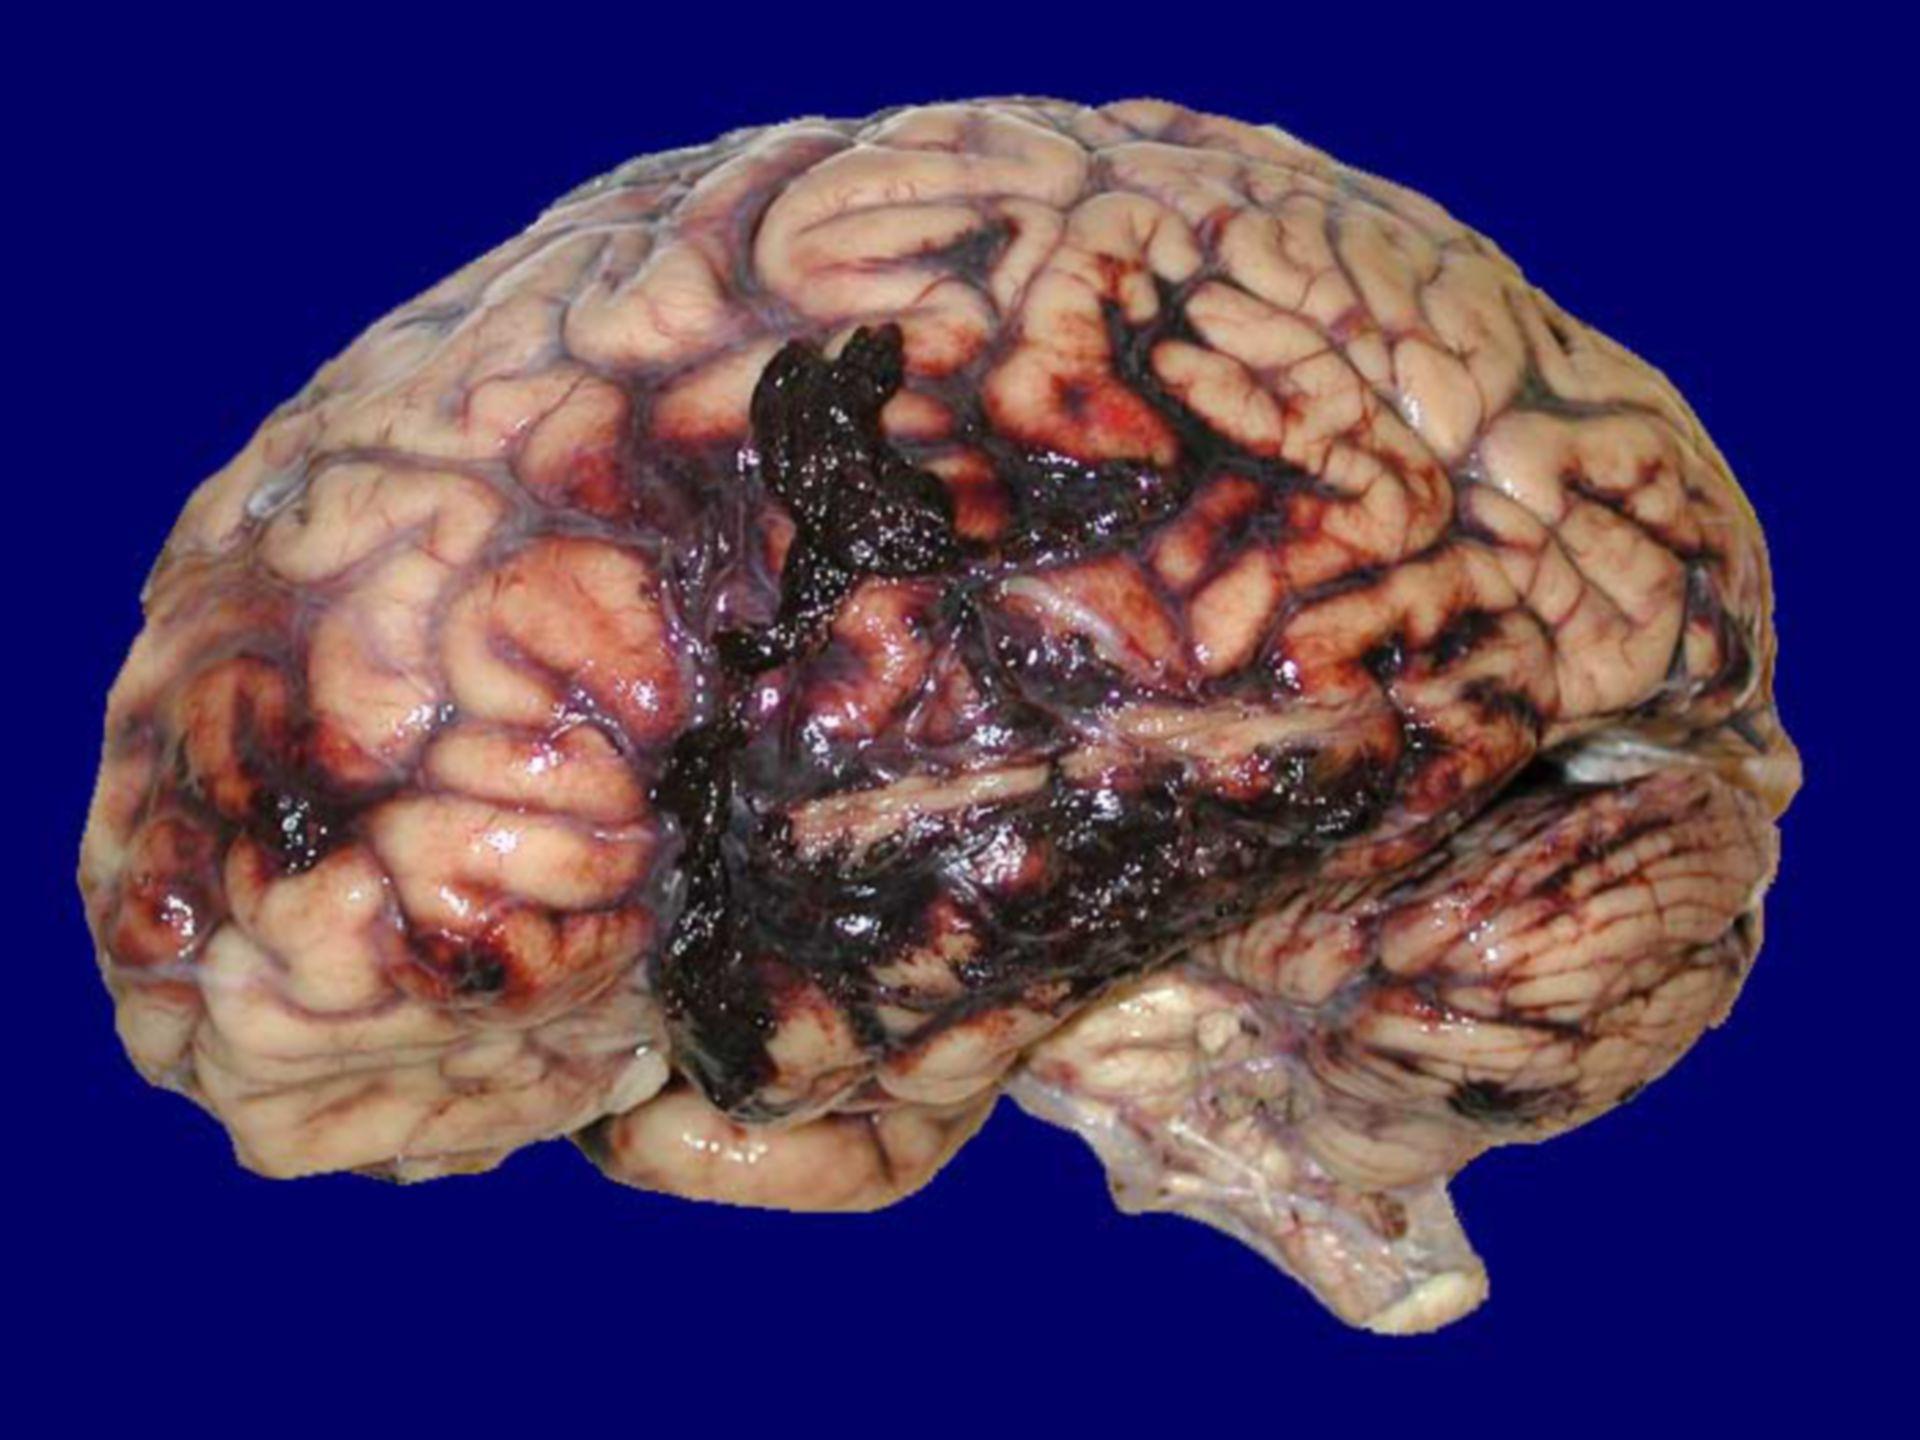 Subdural hematoma and subarachnoid hemorrhage (SAH)